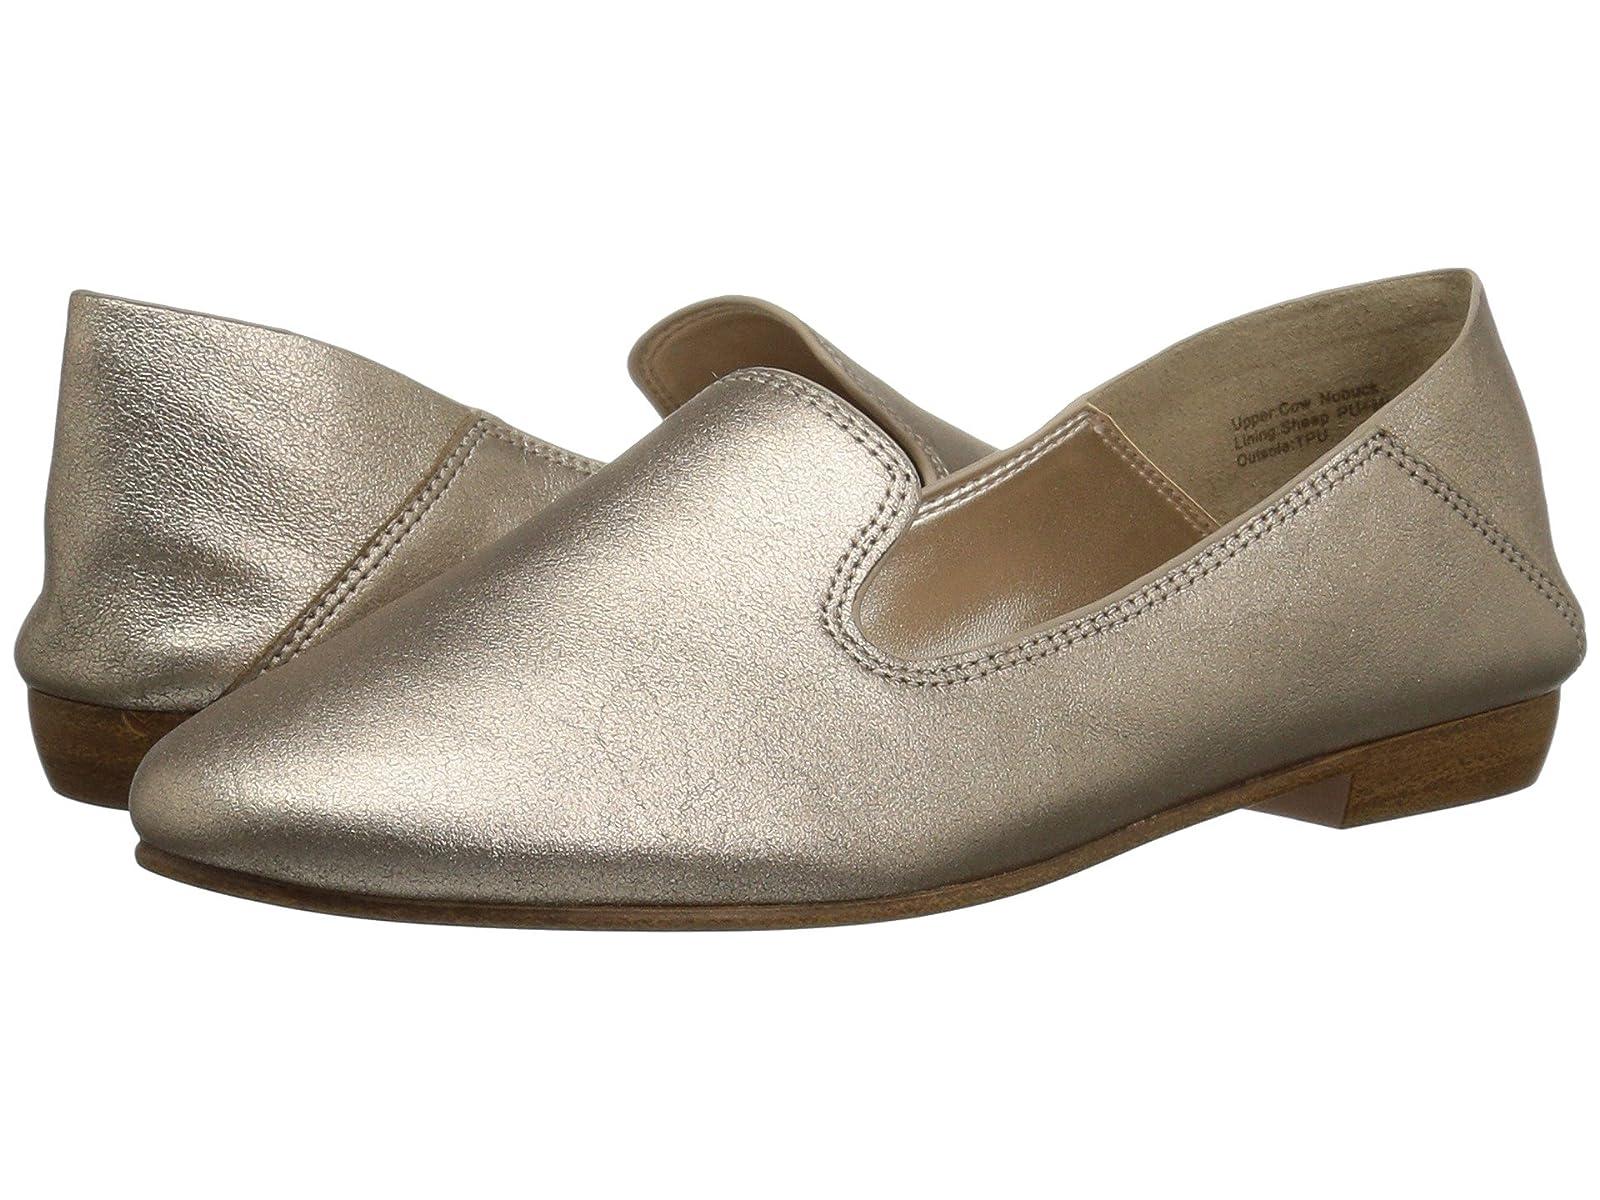 ALDO DimitriaCheap and distinctive eye-catching shoes